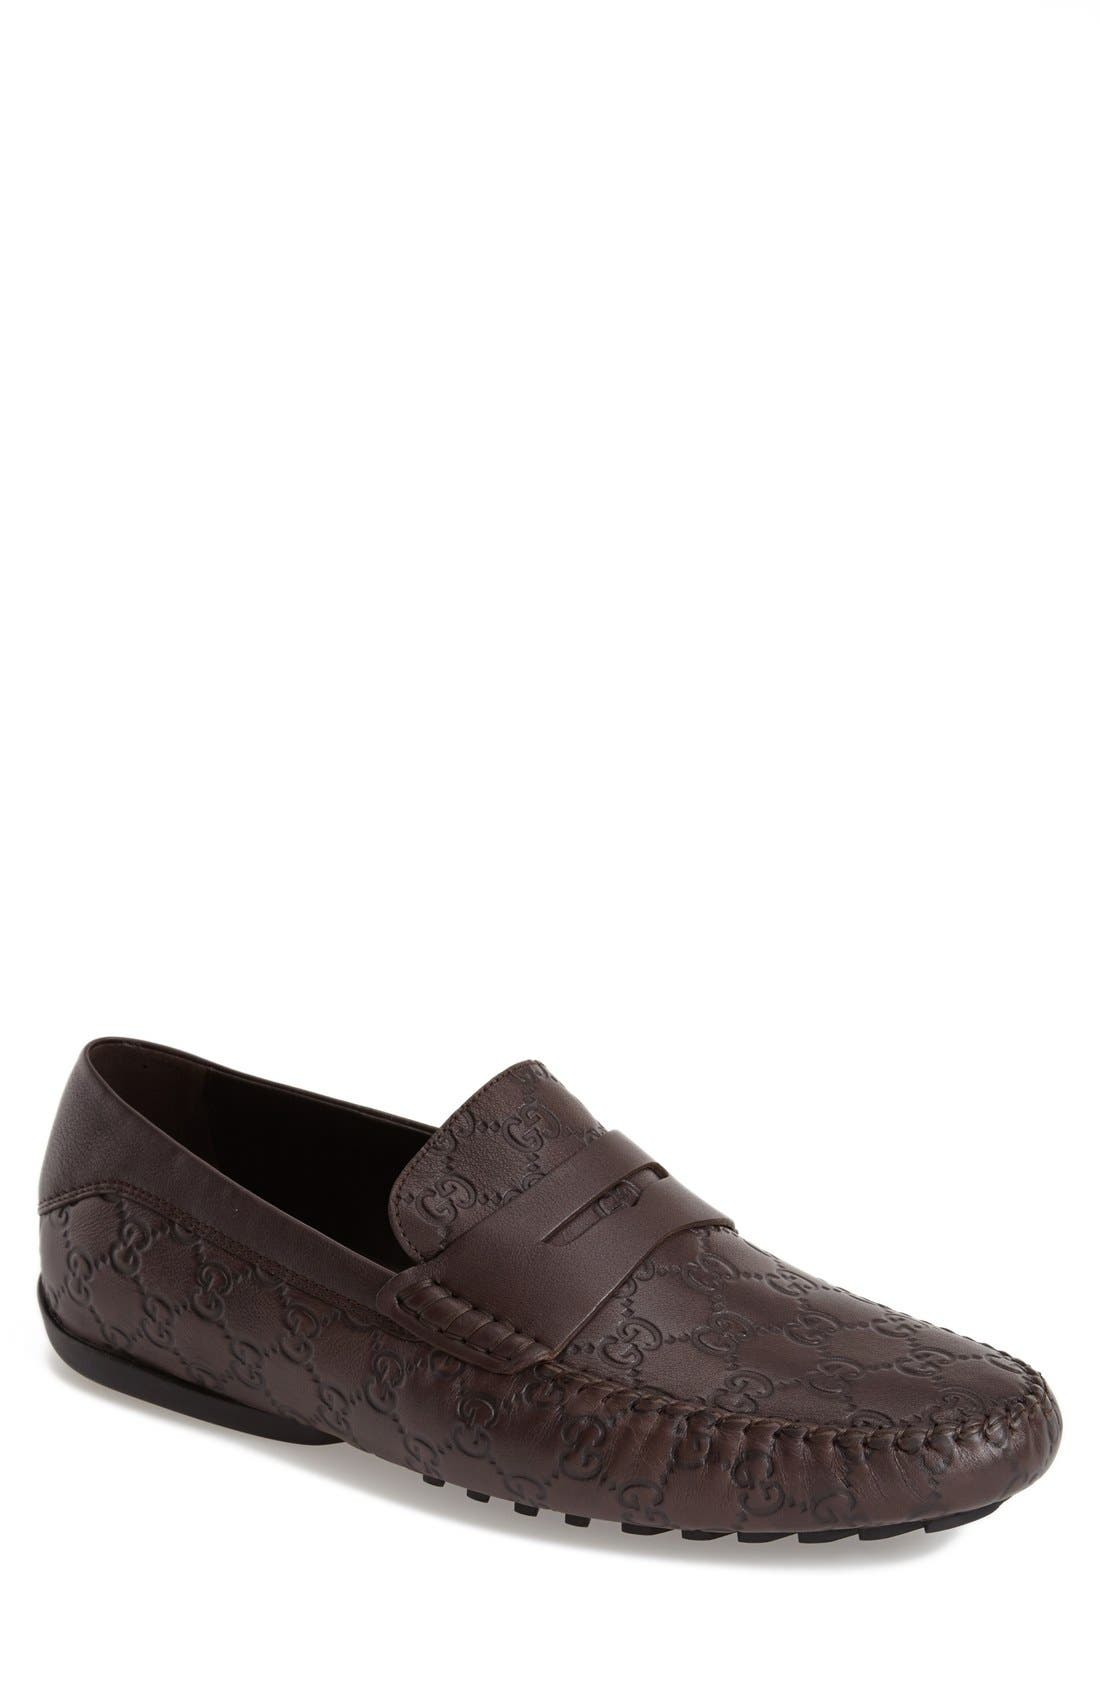 San Marino Driving Shoe,                             Main thumbnail 1, color,                             Dark Chocolate